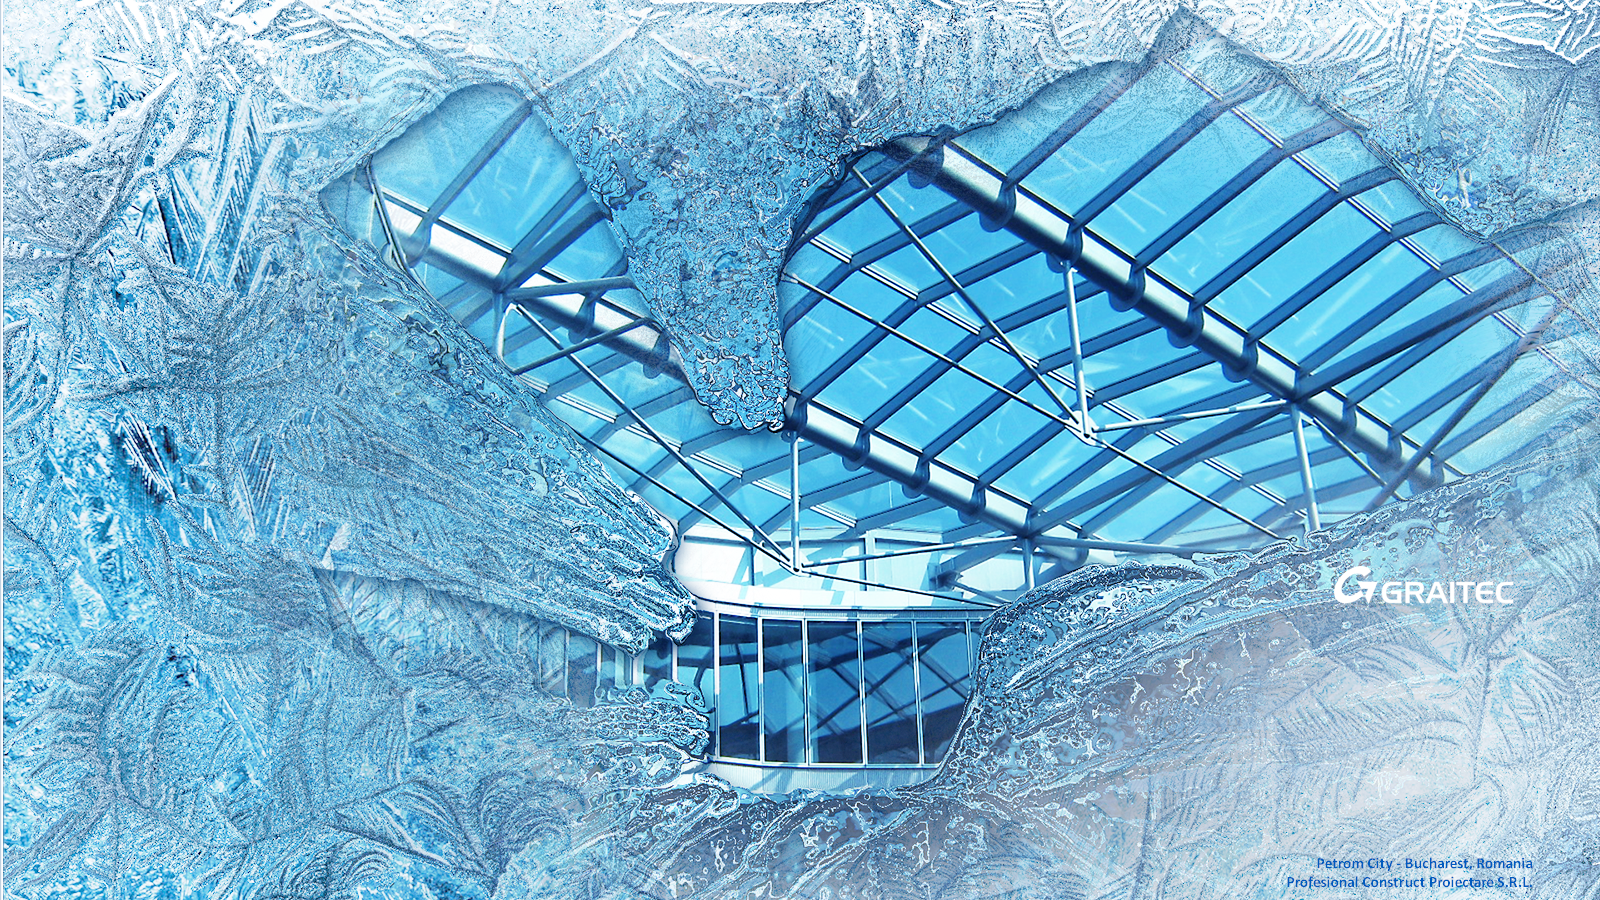 Download GRAITEC wallpaper for January 2015 Civil 1600x900